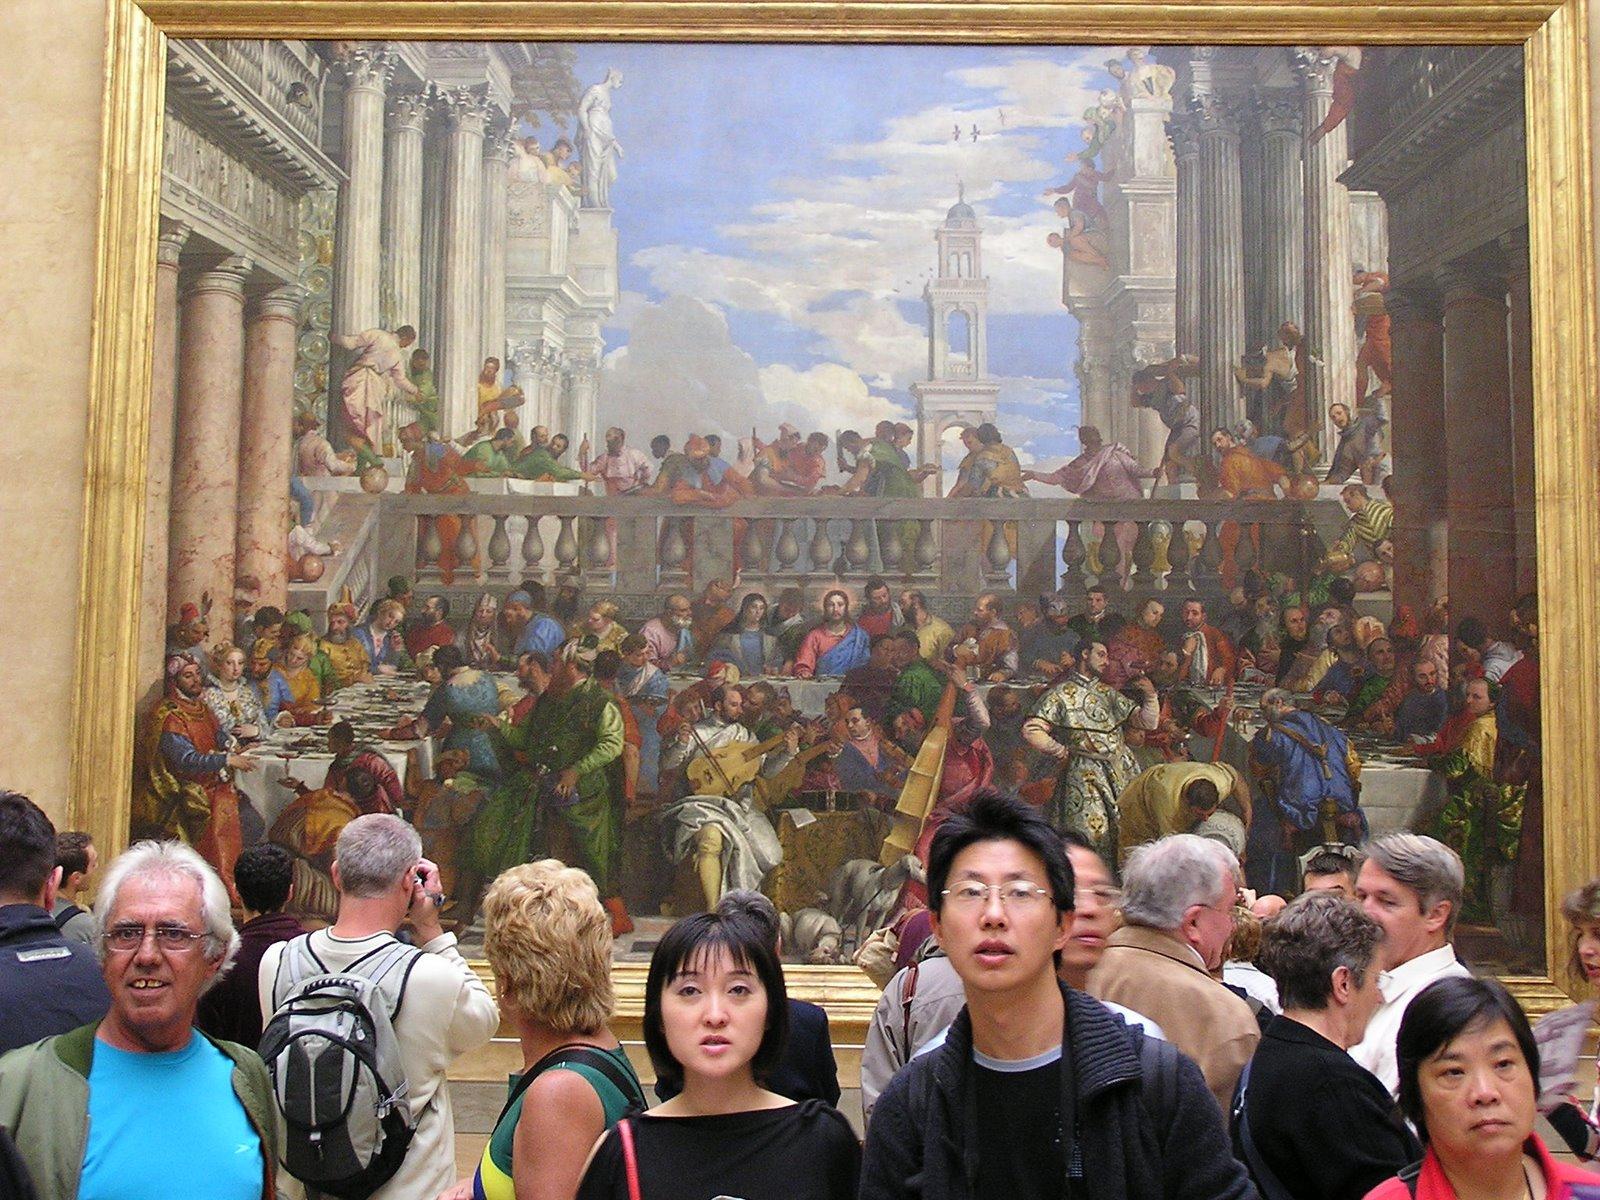 Las Bodas de Caná, Veronese, Elisa N, Blog de Viajes, Lifestyle, Travel, Arte, Louvre, París, Francia